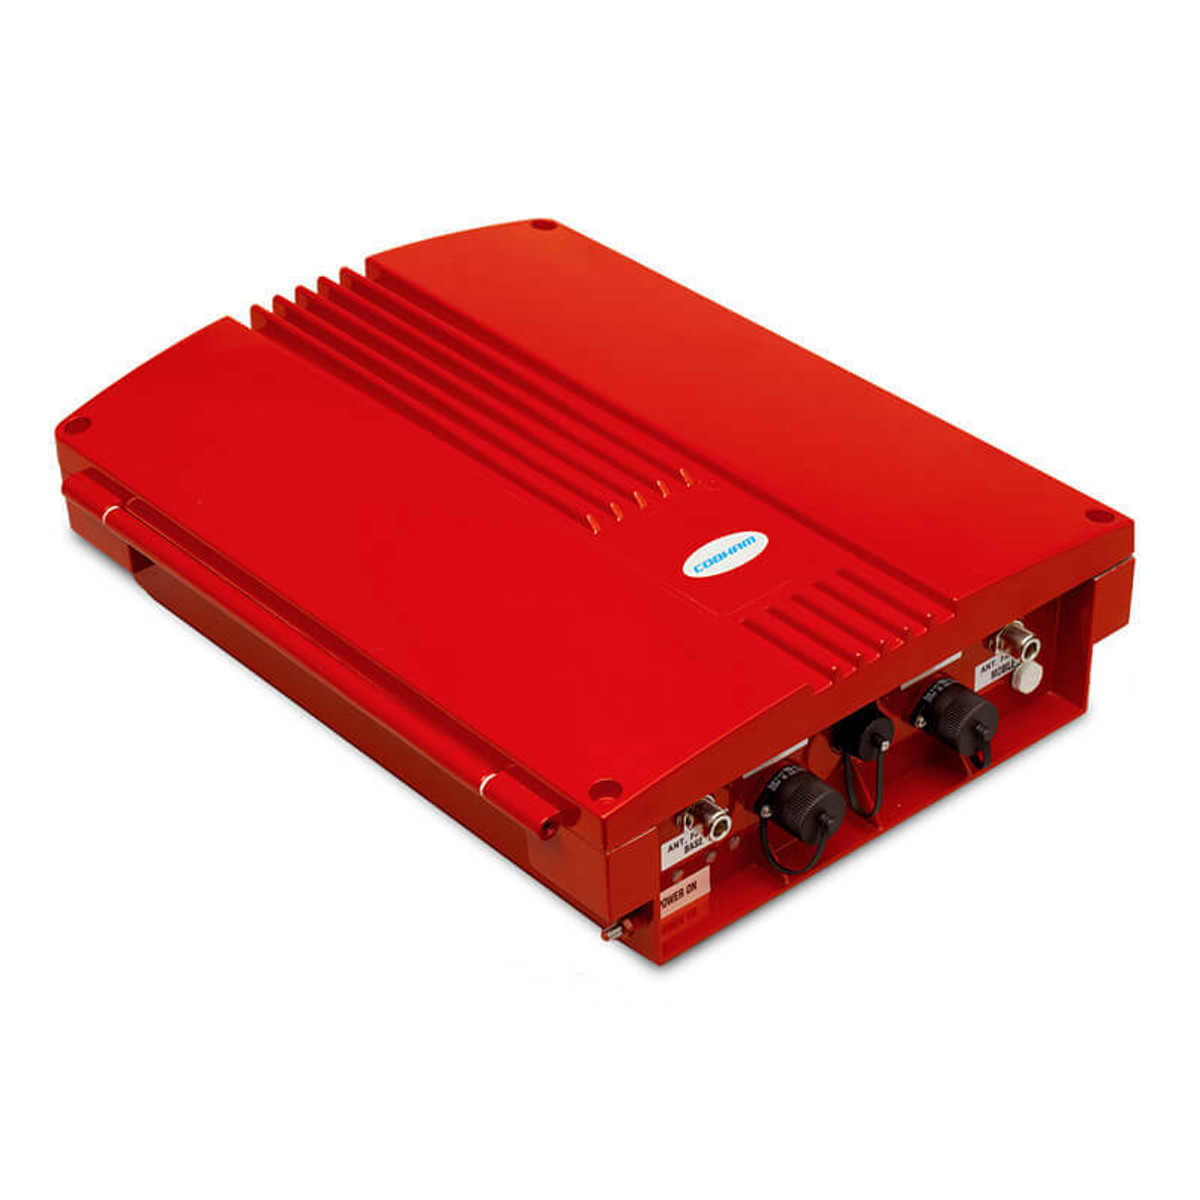 Cobham Cobham 700/800 MHz Digital Multi-Channel Class A RF Signal booster